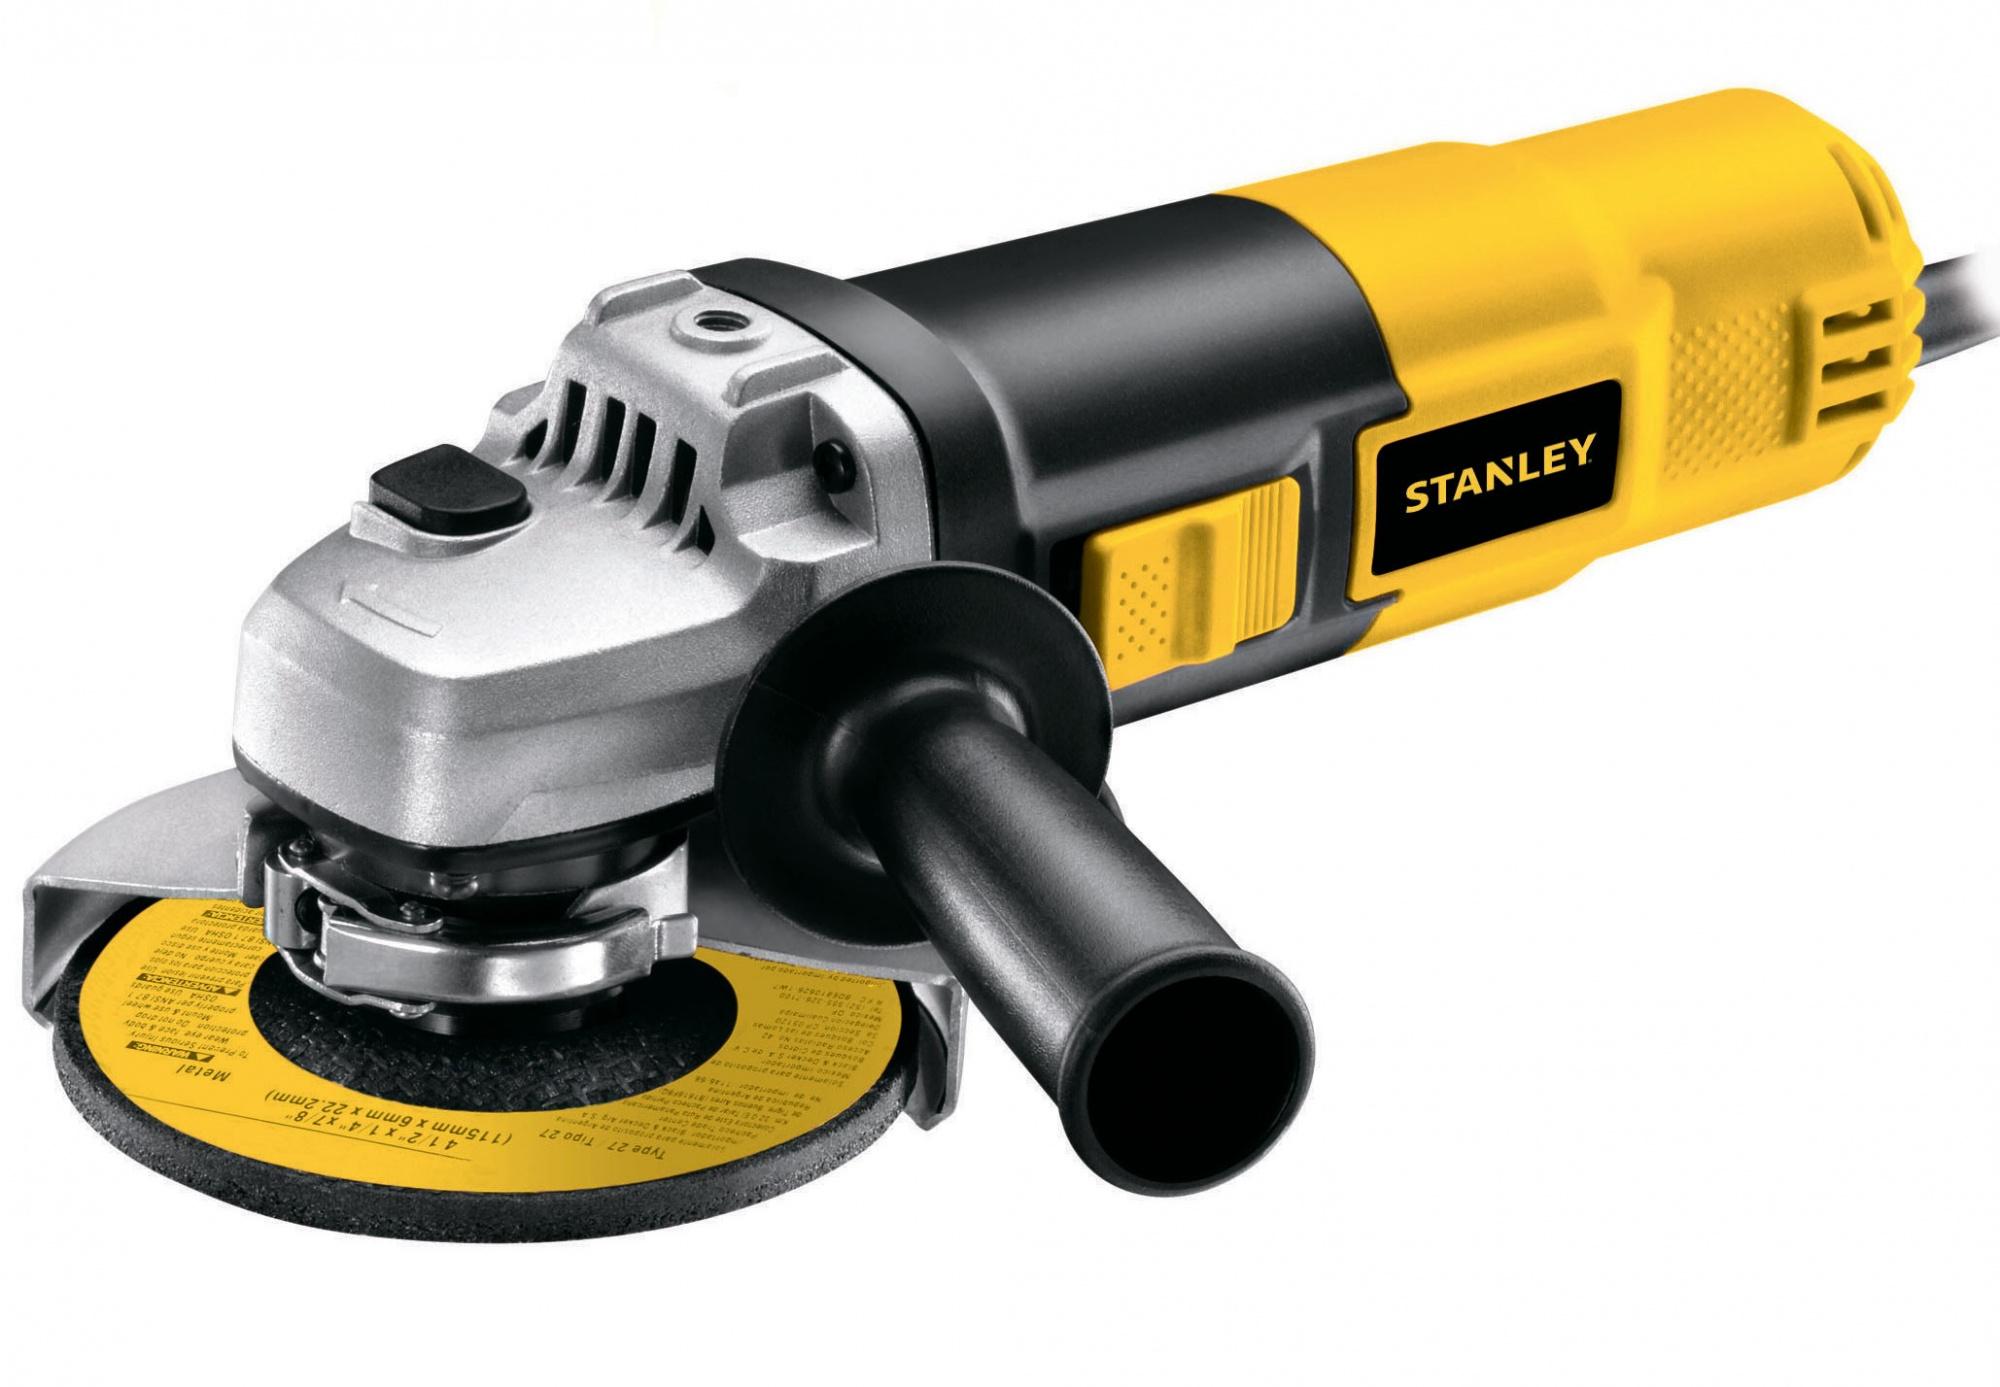 Stanley STGS9115-RU - угловая шлифмашина (Yellow)